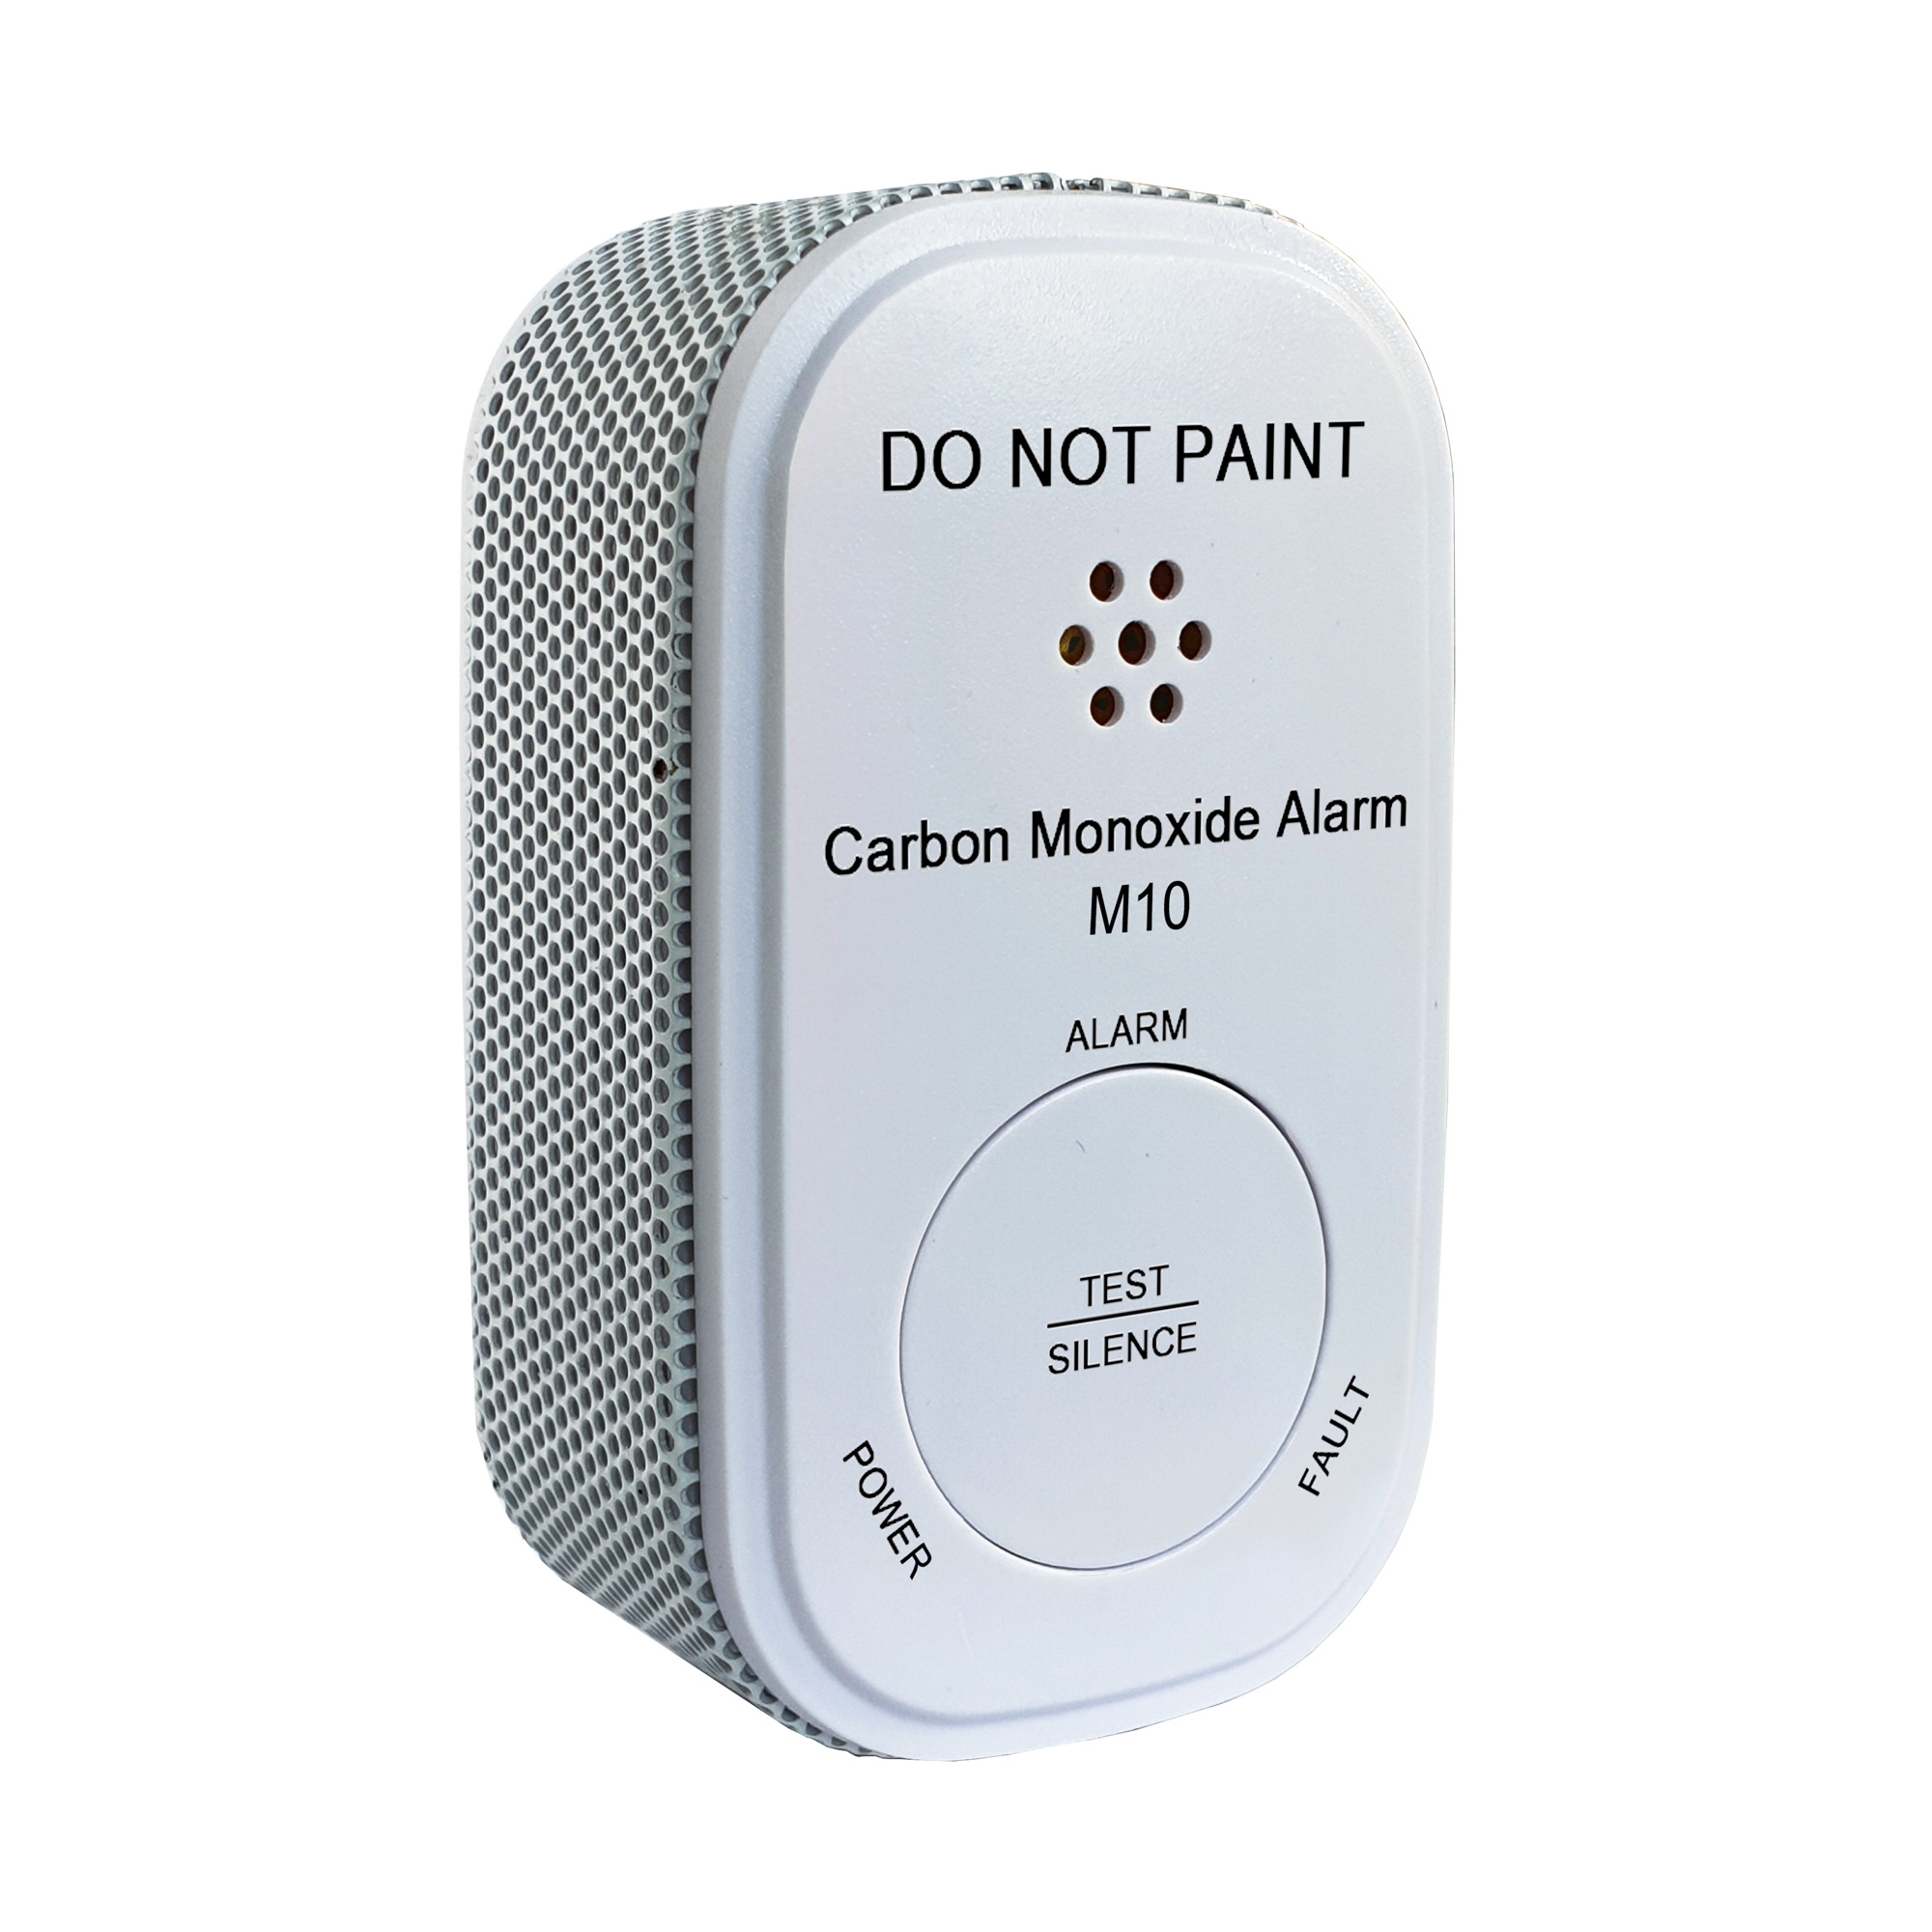 Kohlenmonoxid Alarm CO Rauchmelder Stabile Sicherheit LED-Anzeige Gassensor DE